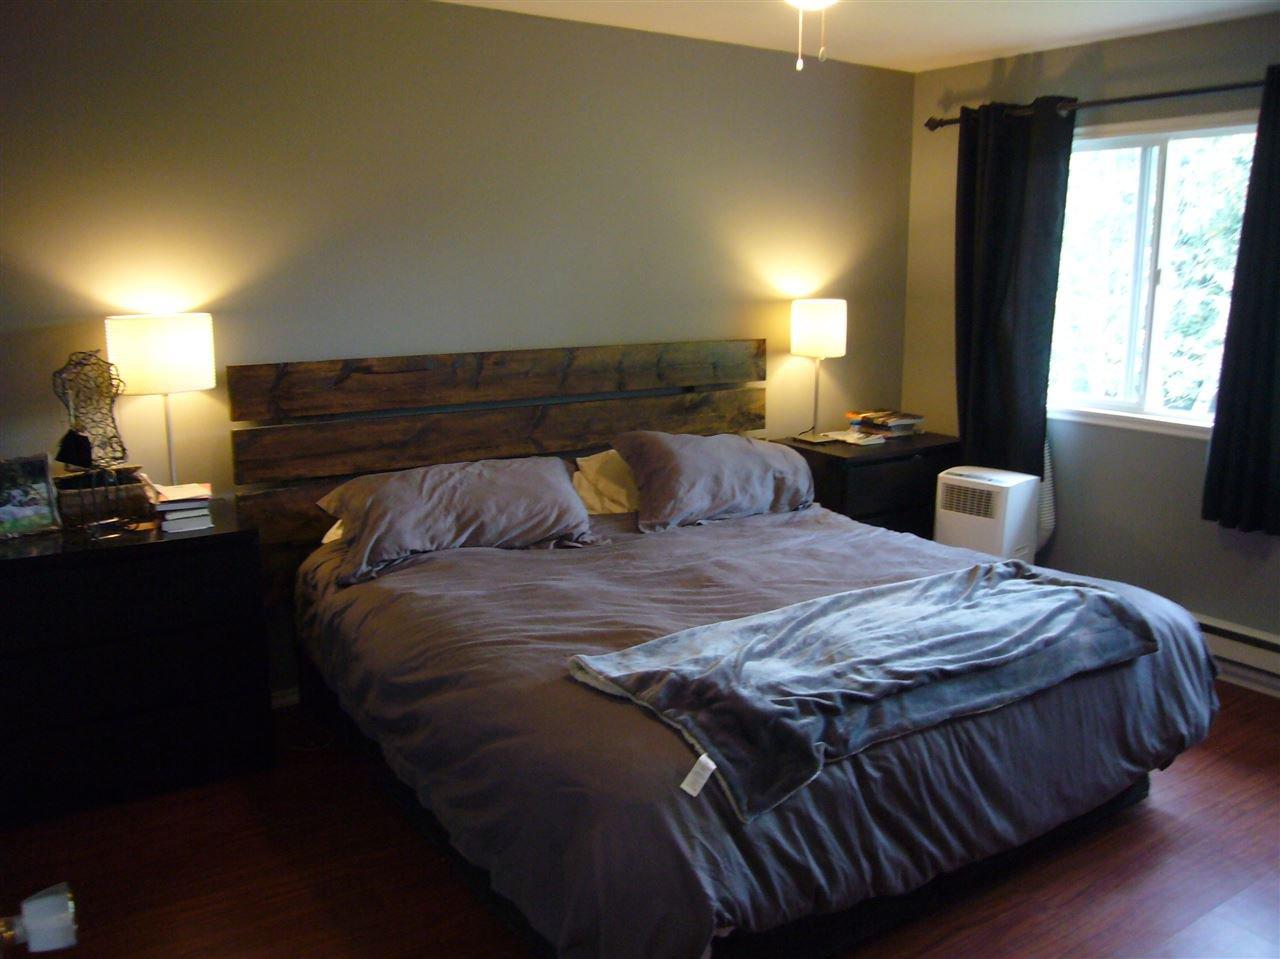 Photo 6: Photos: 6580 EVANS Road in Sardis: Sardis West Vedder Rd House for sale : MLS®# R2085581